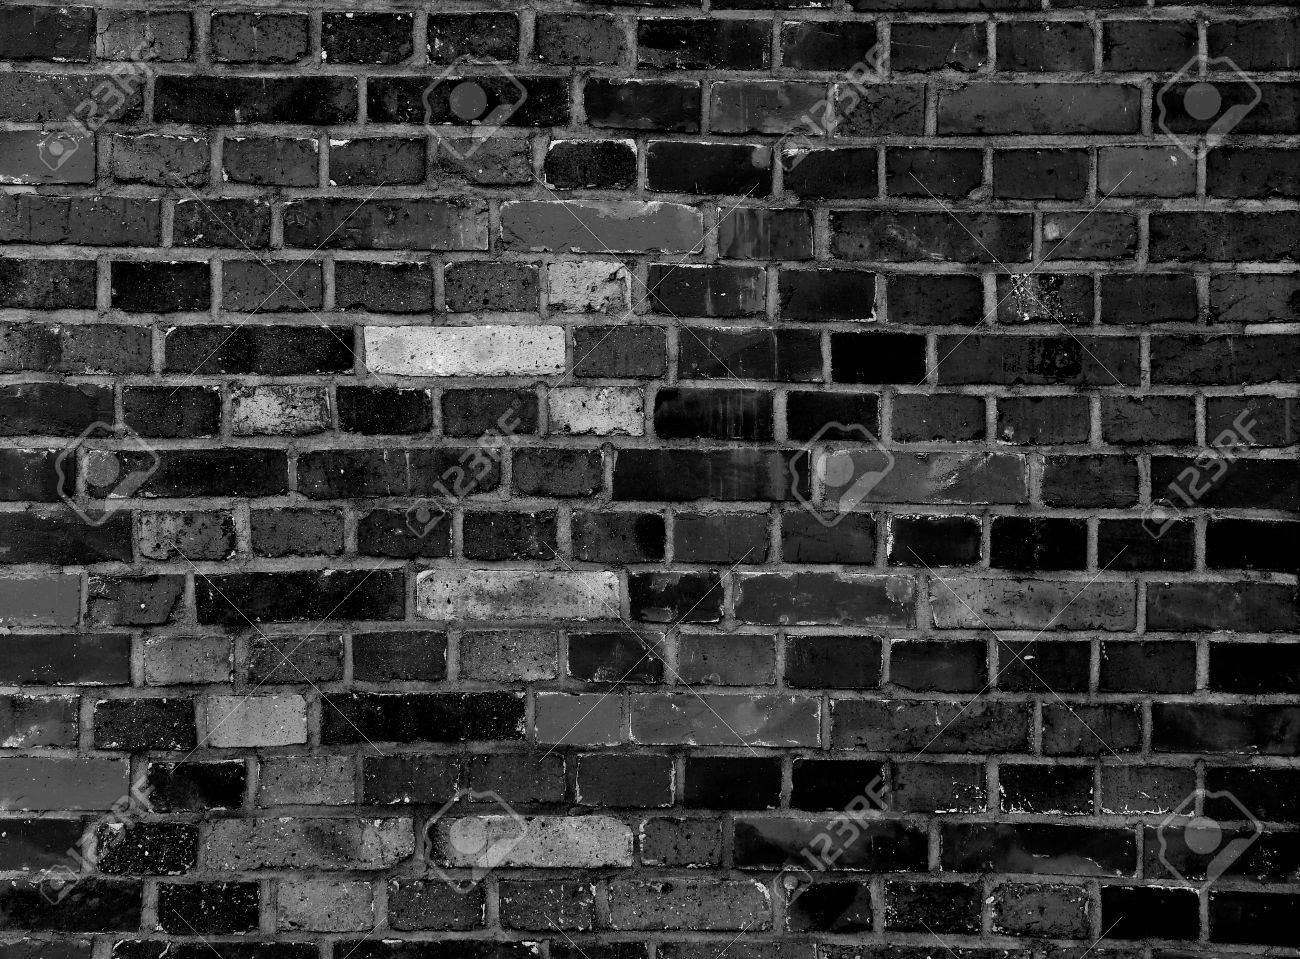 Black Brick Part - 32: Black Brick Wall Texture Grunge Background Stock Photo - 44092812